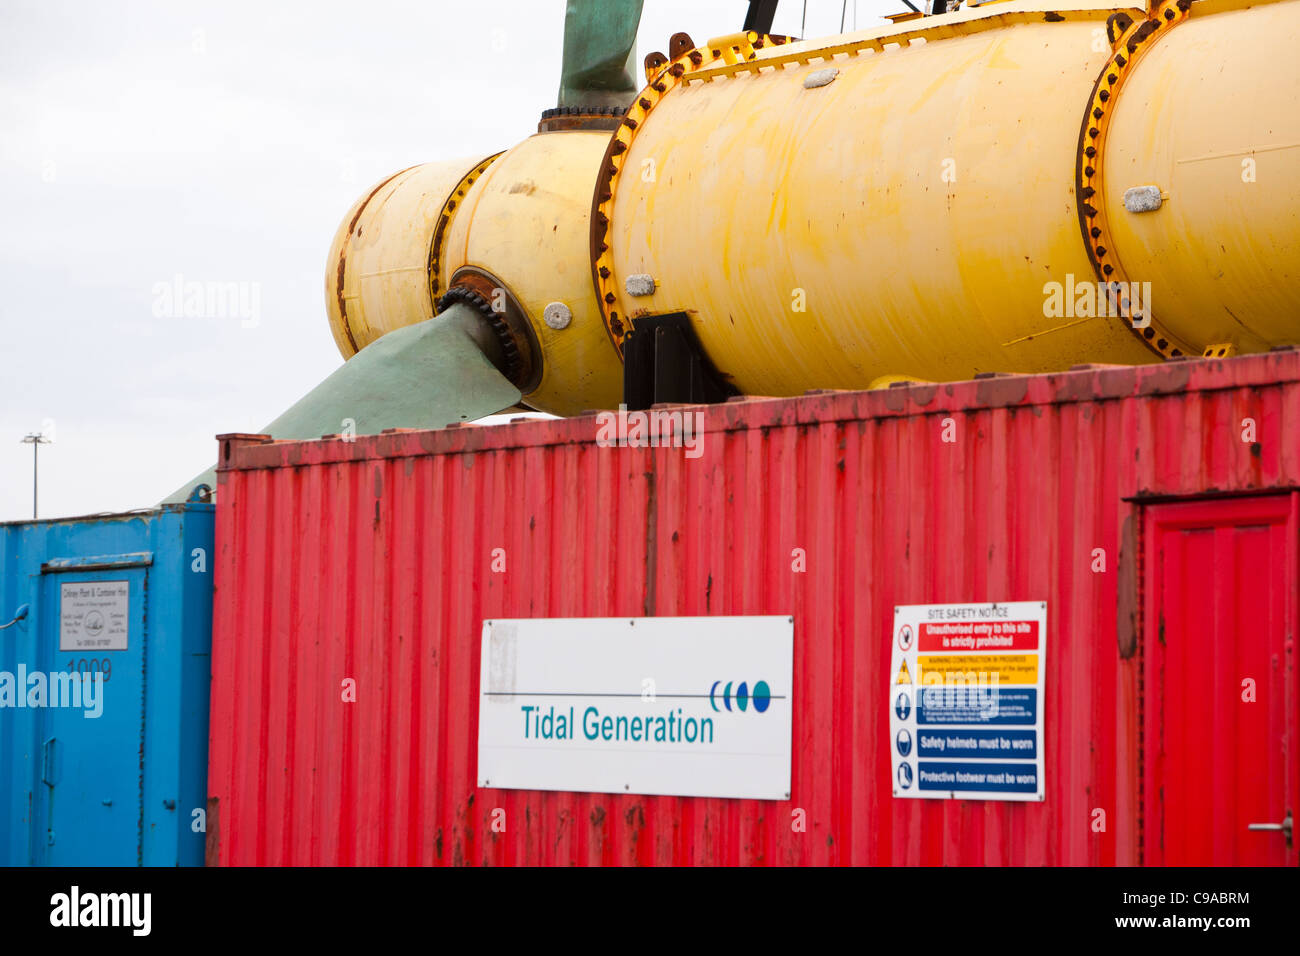 A tidal energy turbine on the dockside in Kirkwall, Orkney, Scotland, UK. - Stock Image